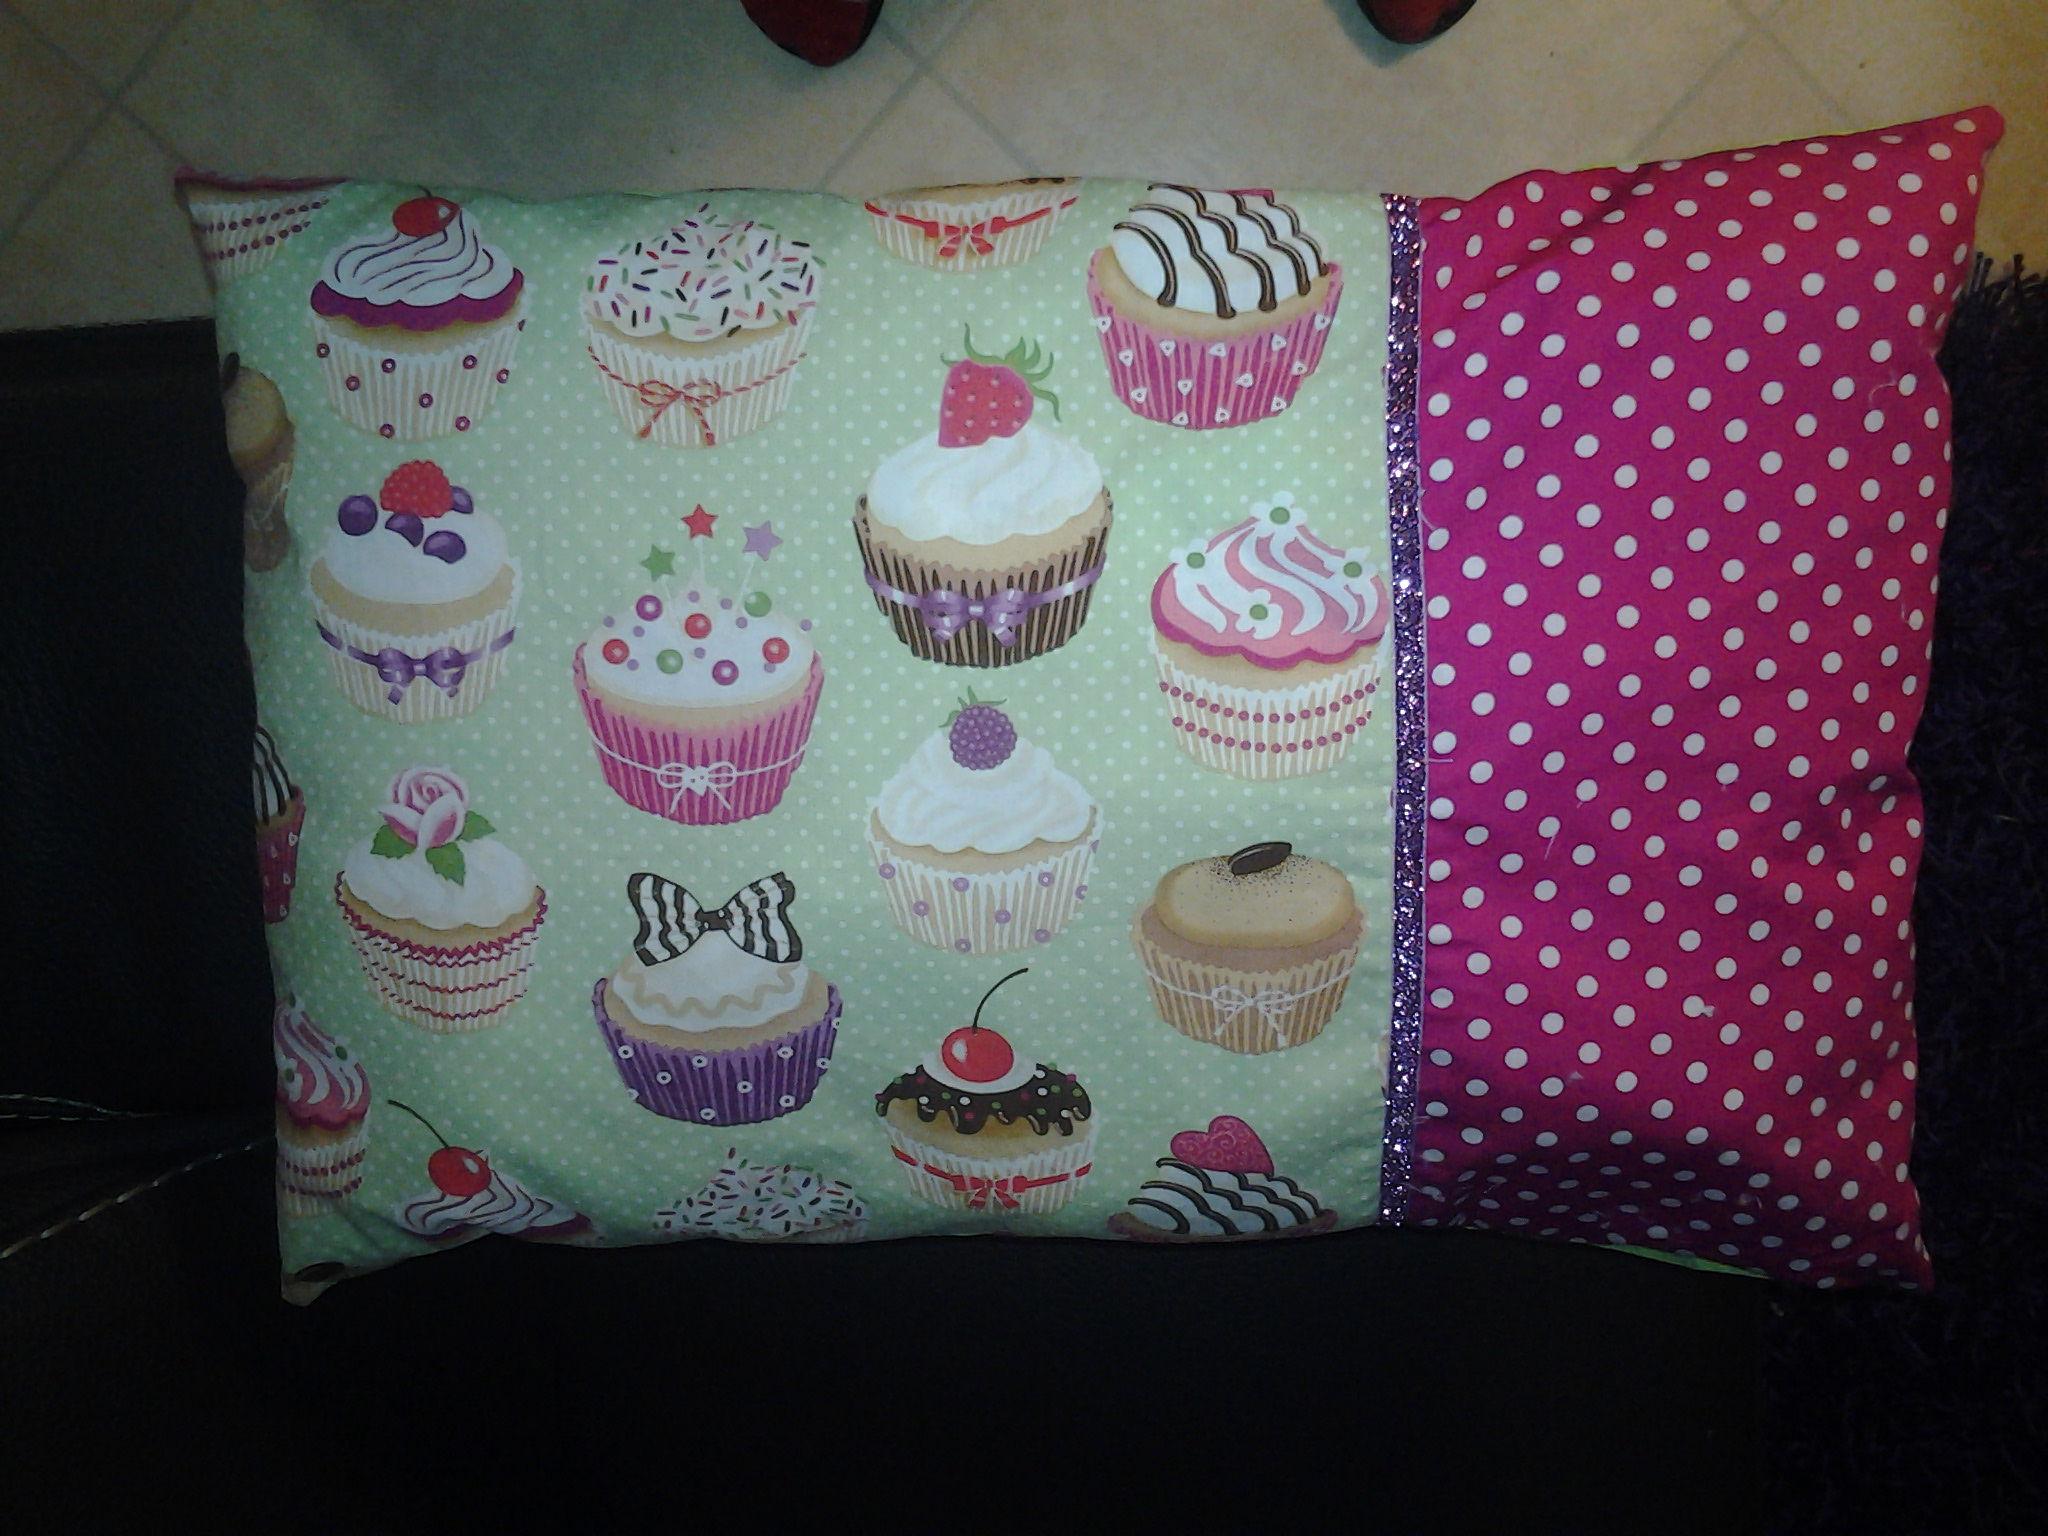 Coussin cupcake.... so cute!!